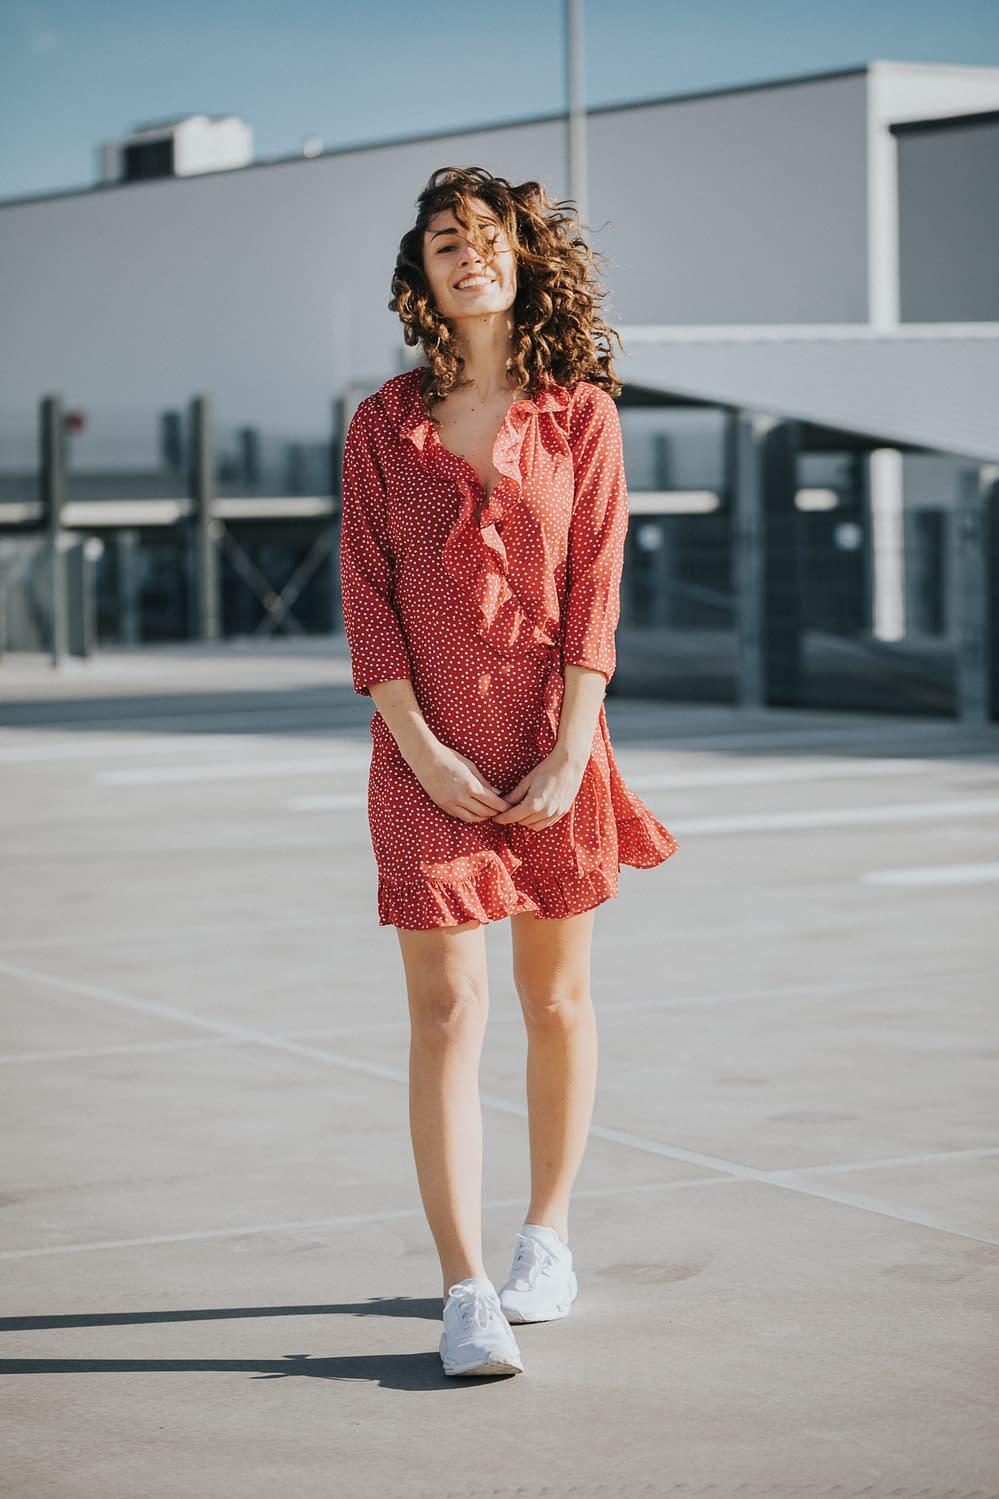 Portrait Luisa - Lifestyle Mode Fotografie